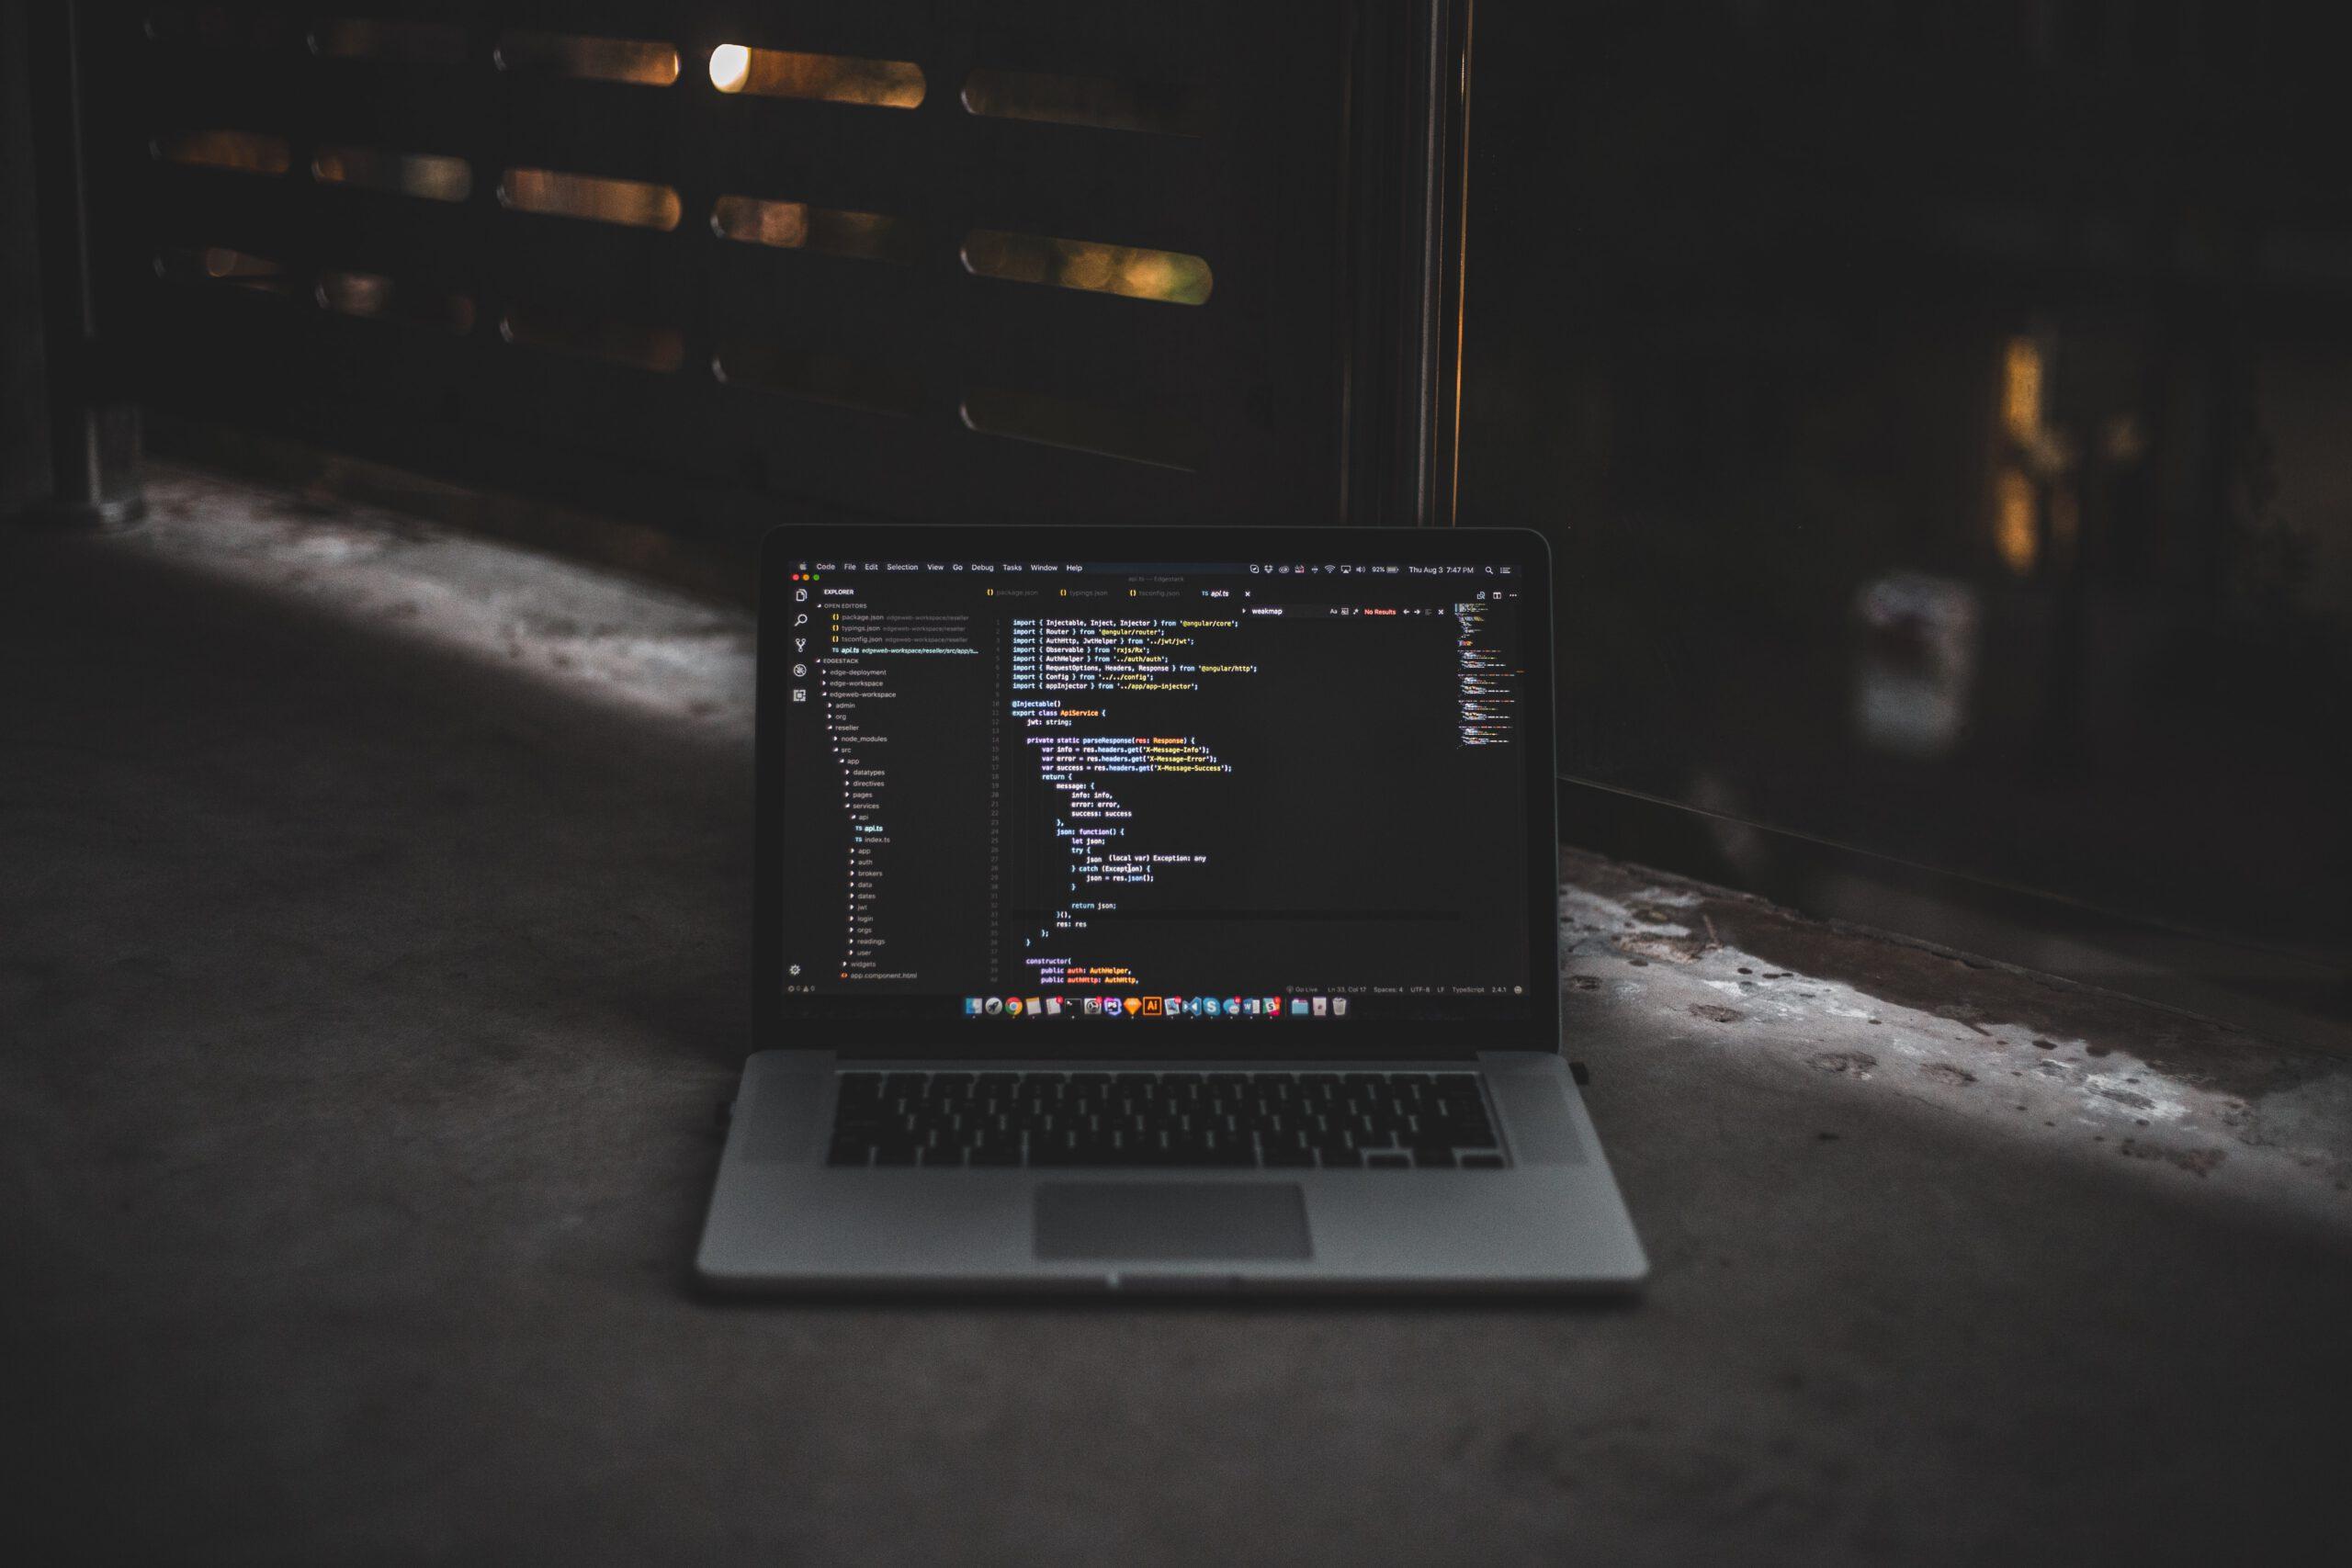 Tietokoneapua_kansikuva